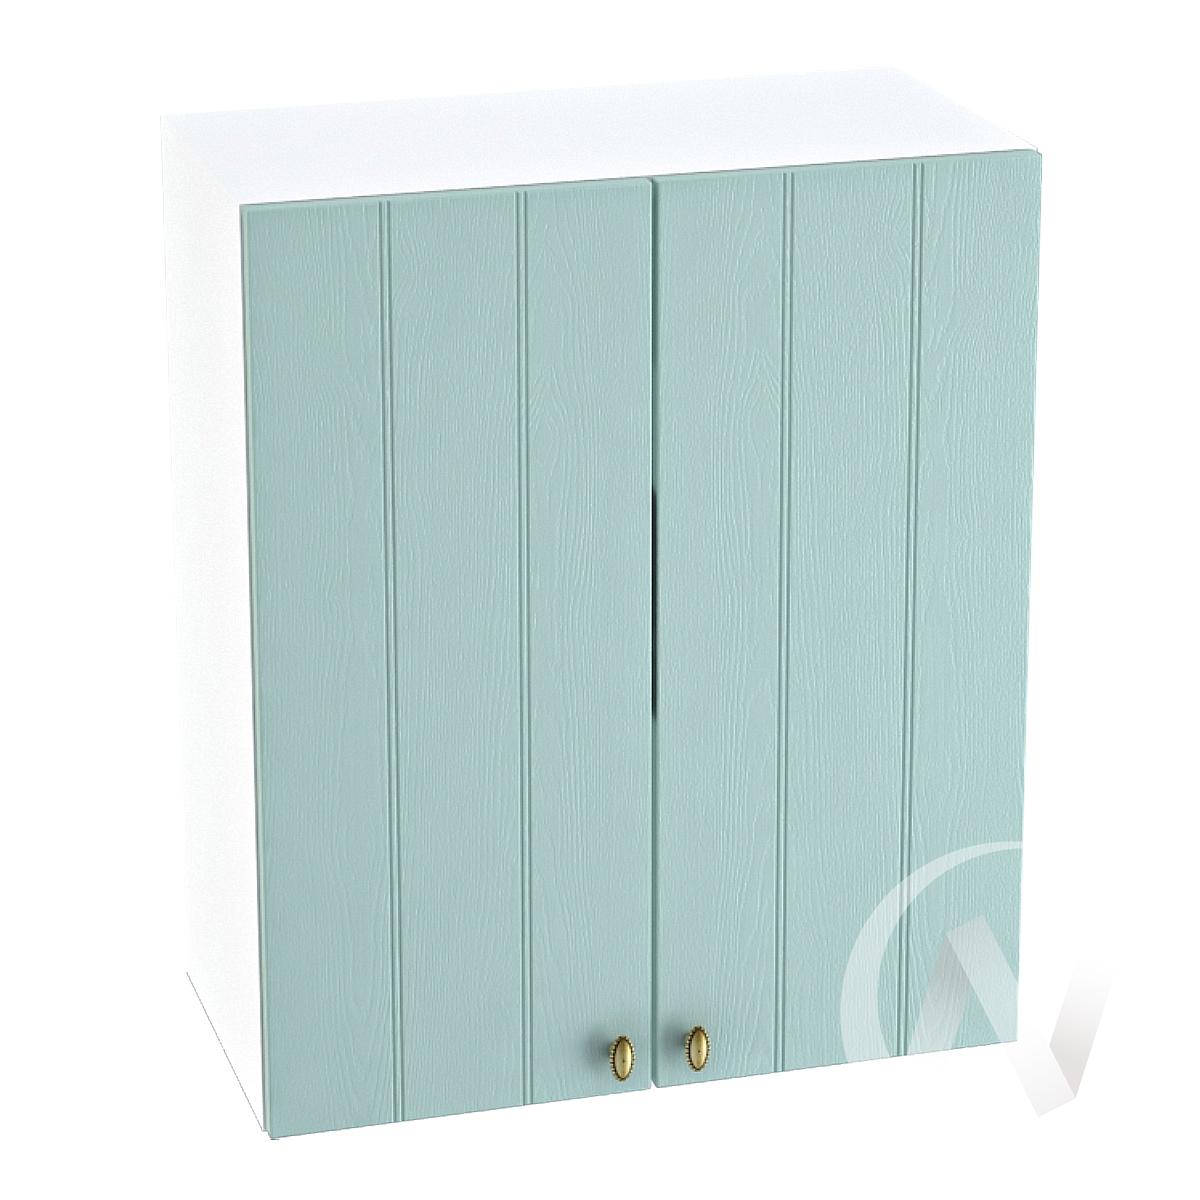 "Кухня ""Прованс"": Шкаф верхний 600, ШВ 600 (голубой/корпус белый)"